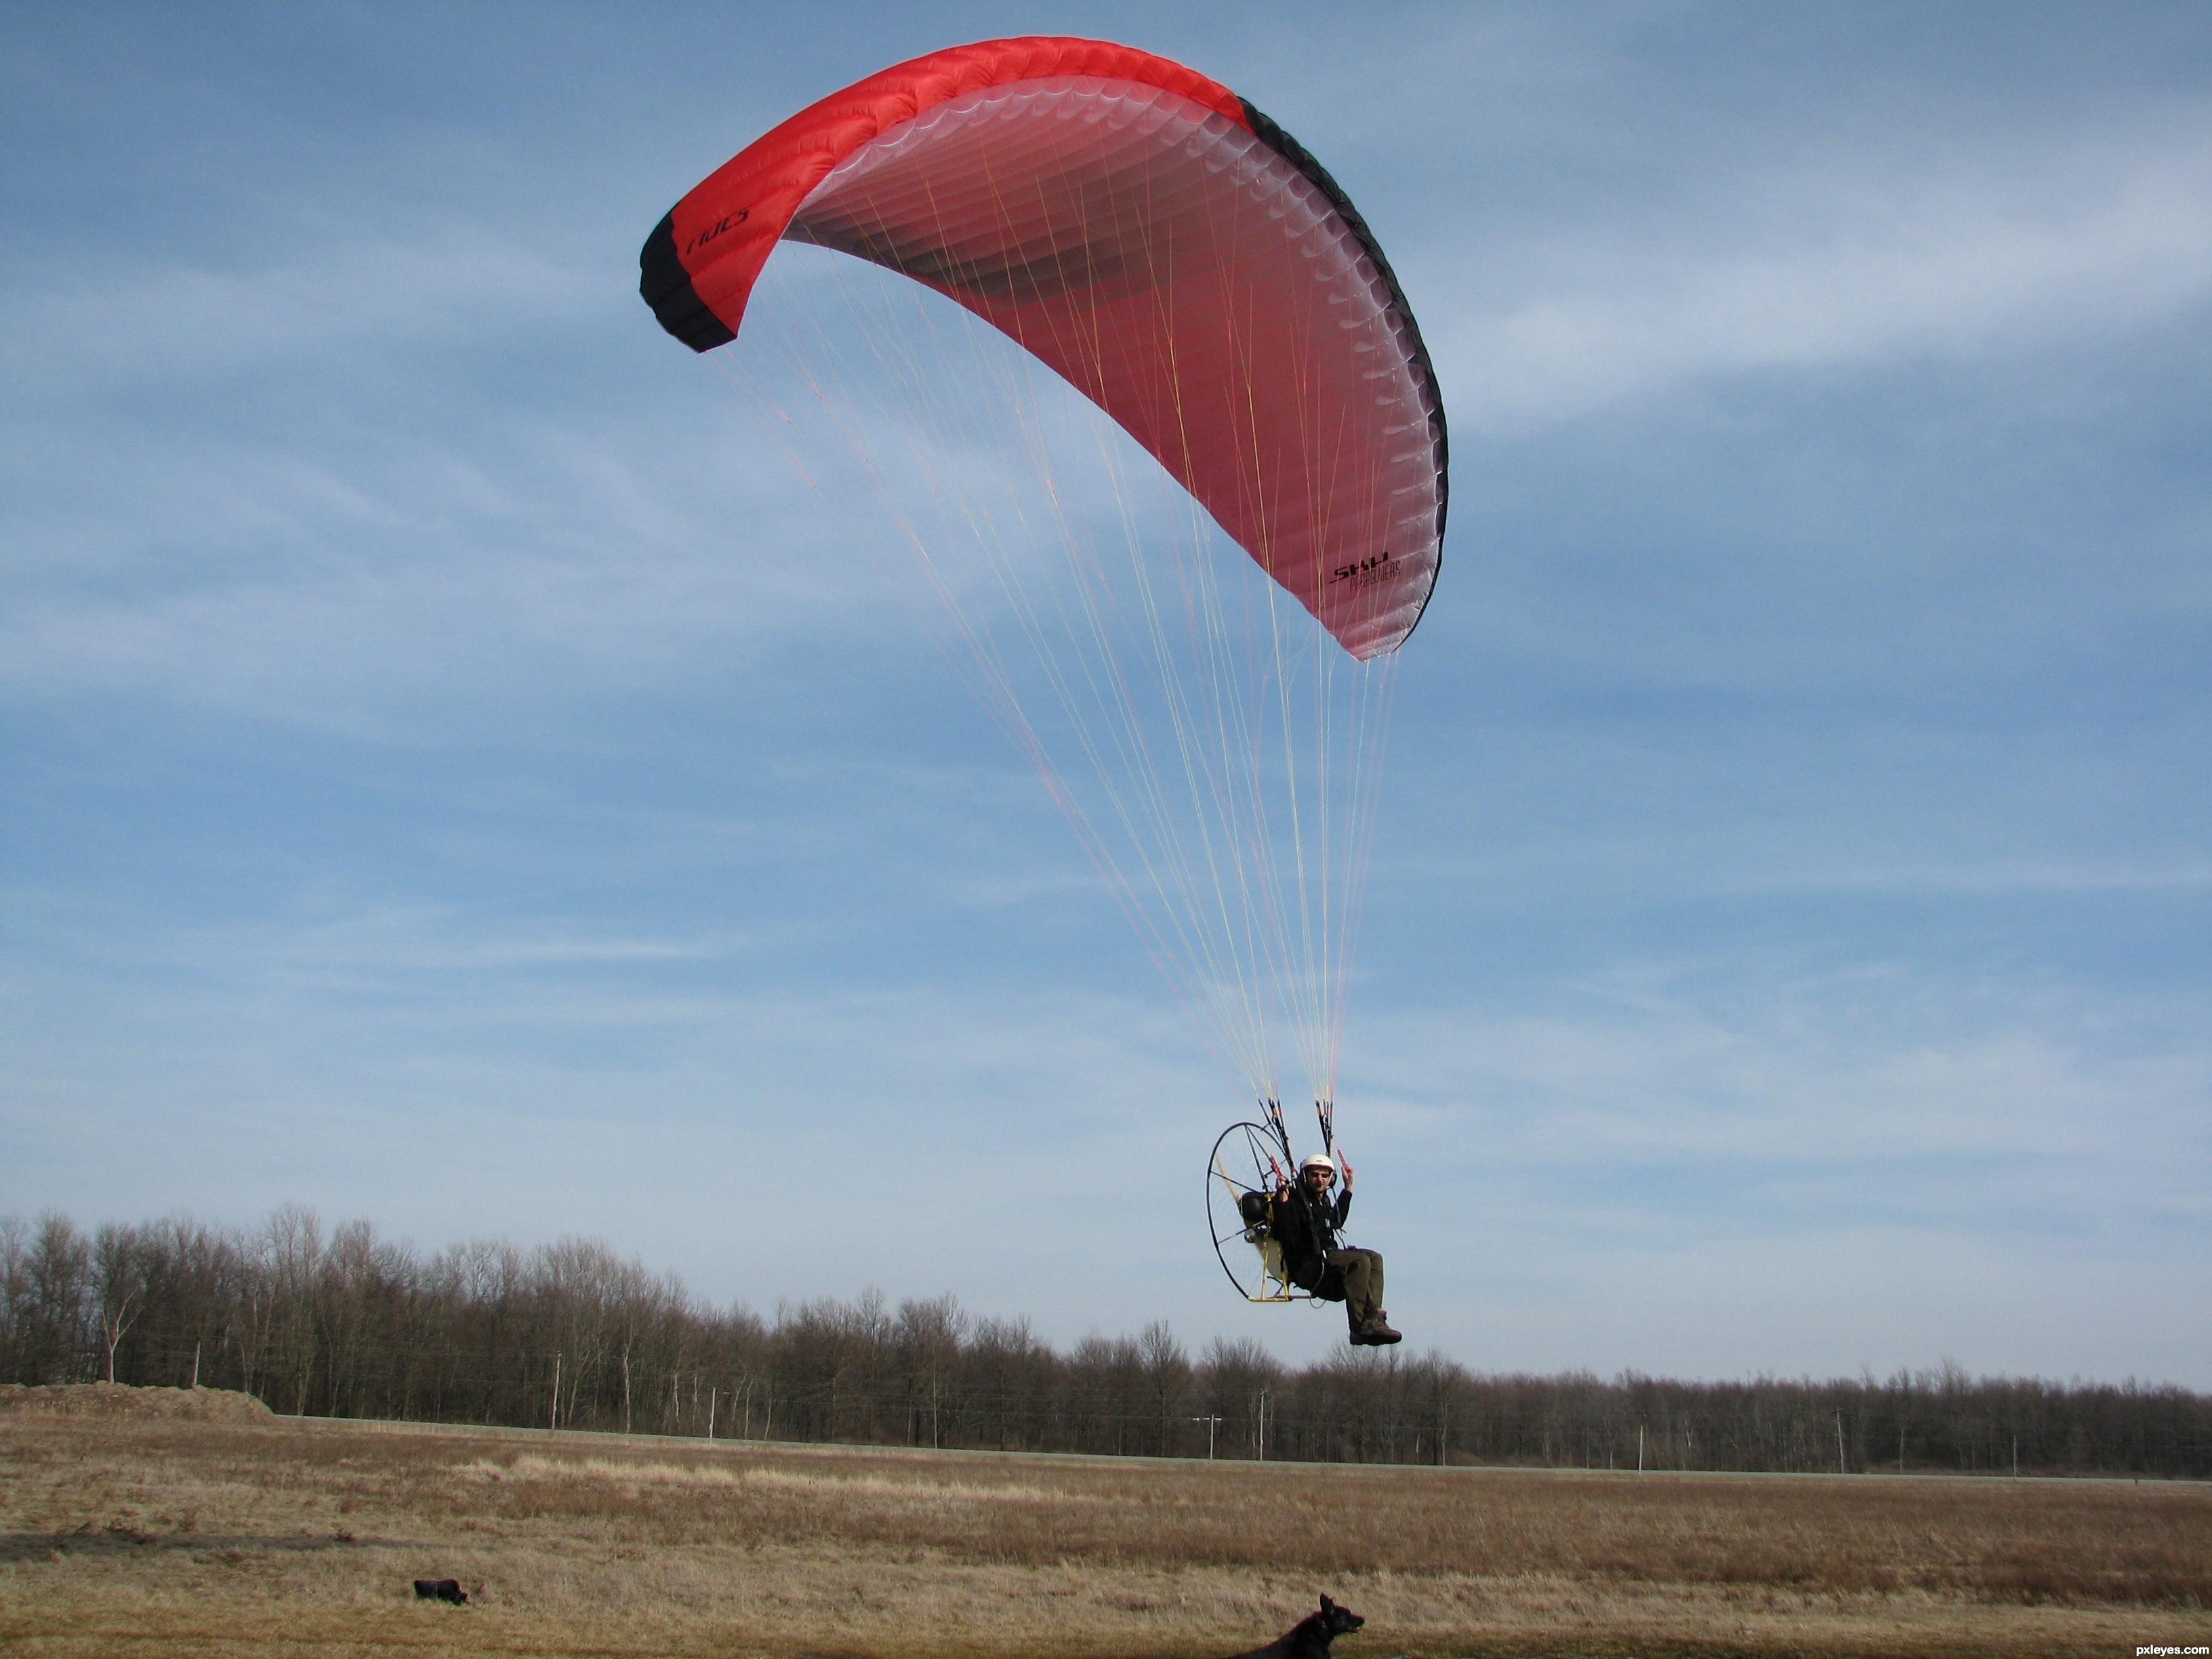 Paragliding - Bing images